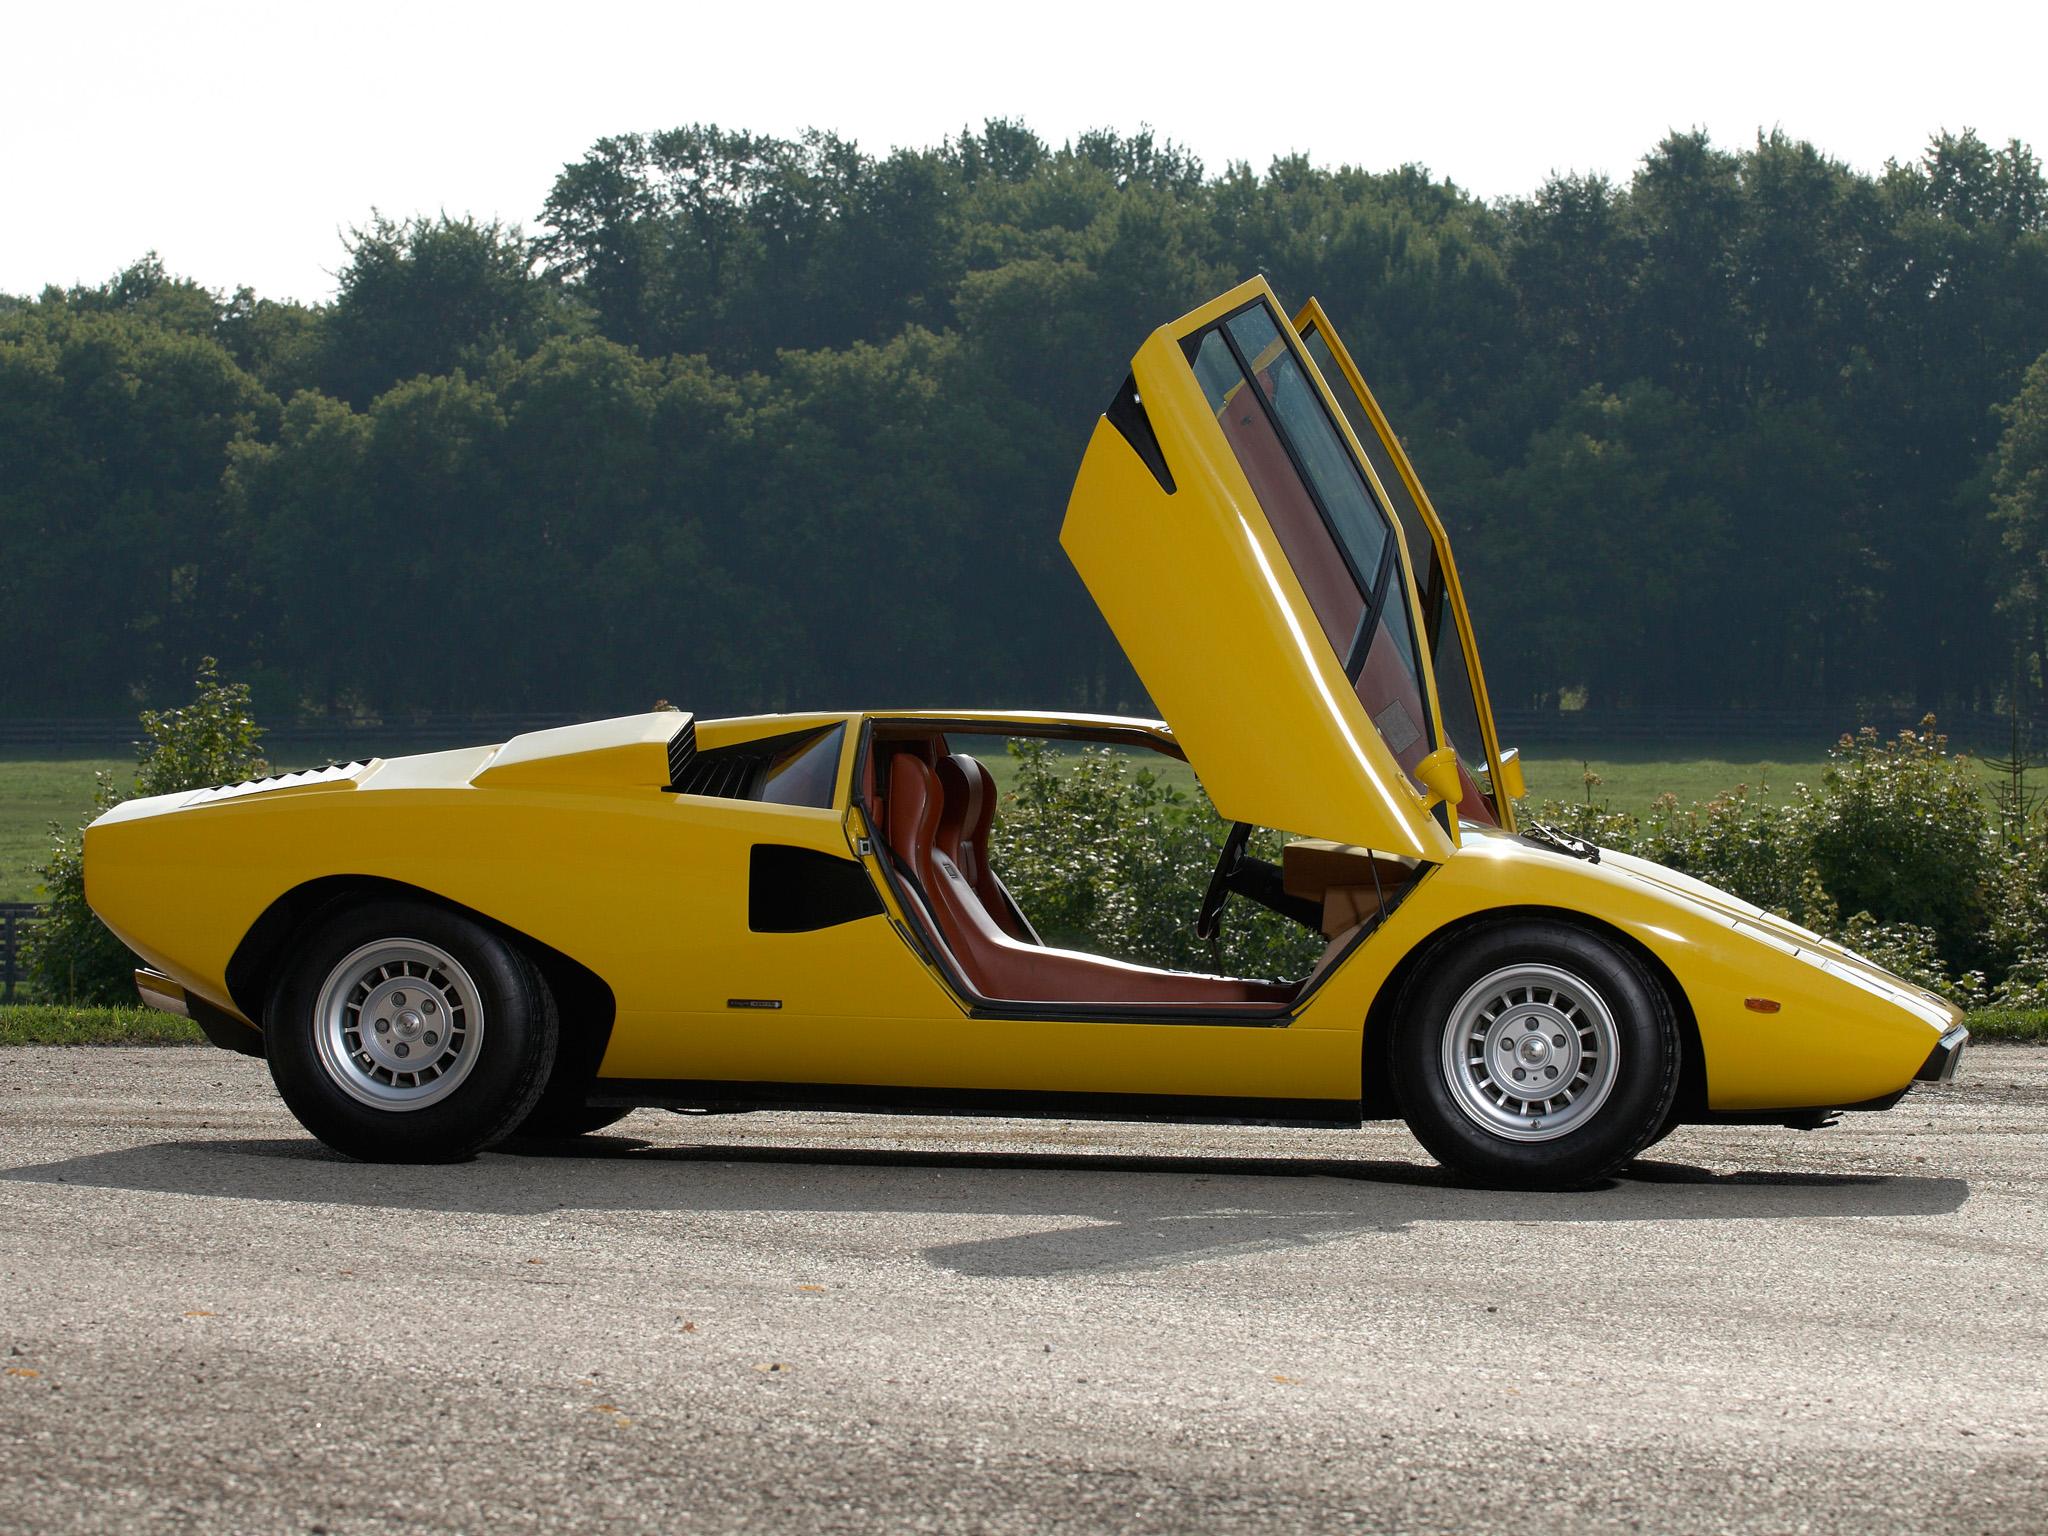 Lamborghini Countach Lp400 Motor Pinterest